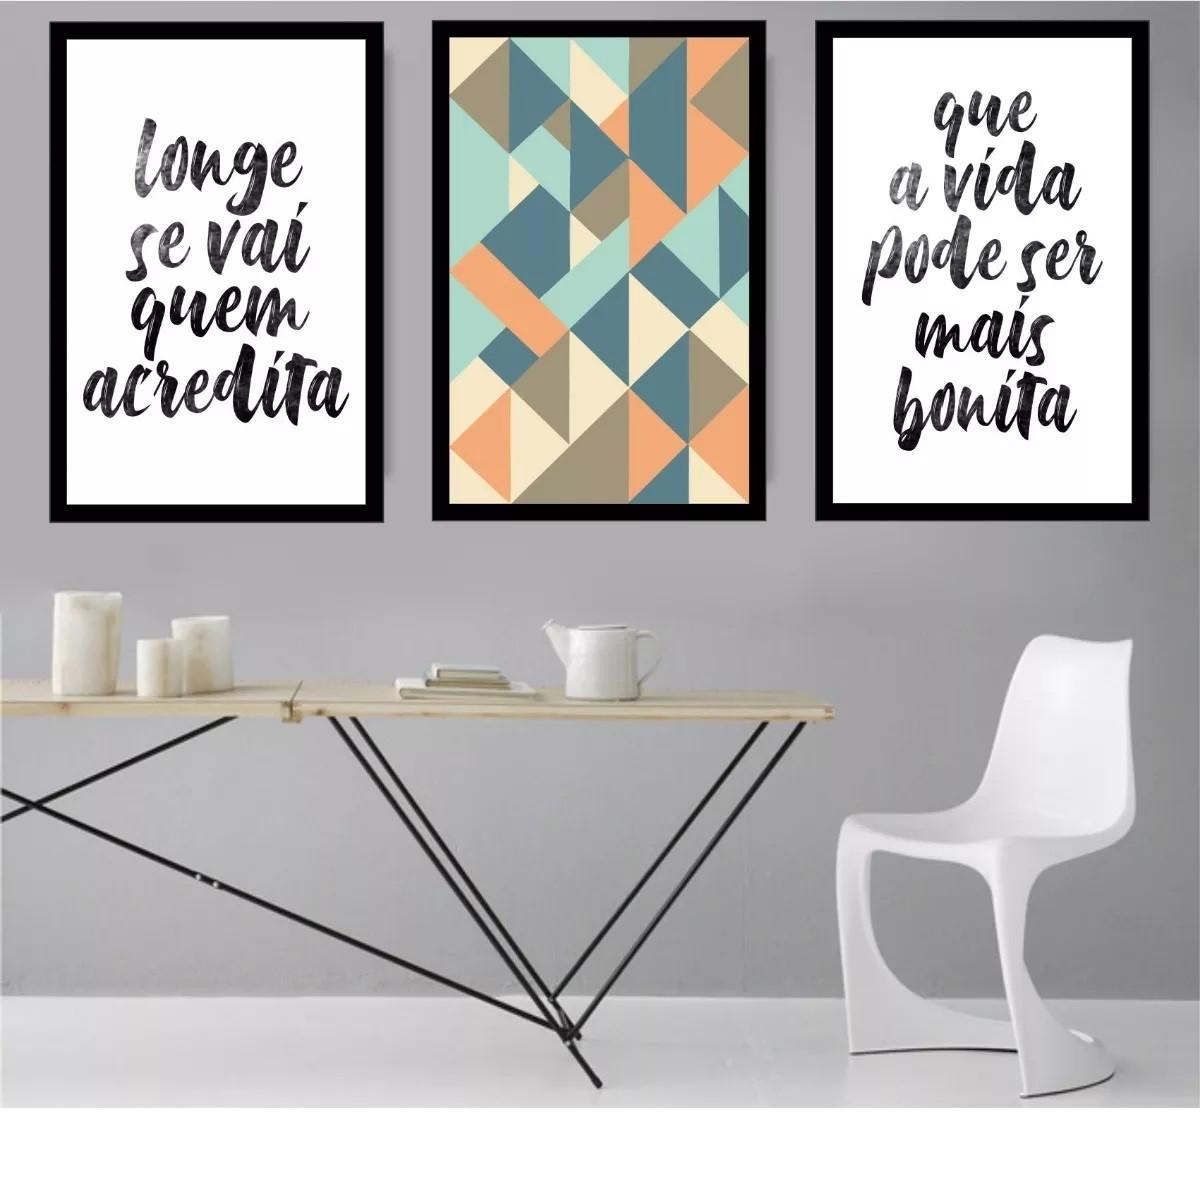 4db1b4ea4 Kit de Quadros Decorativos Poster Longe Se Vai Quem Acredita